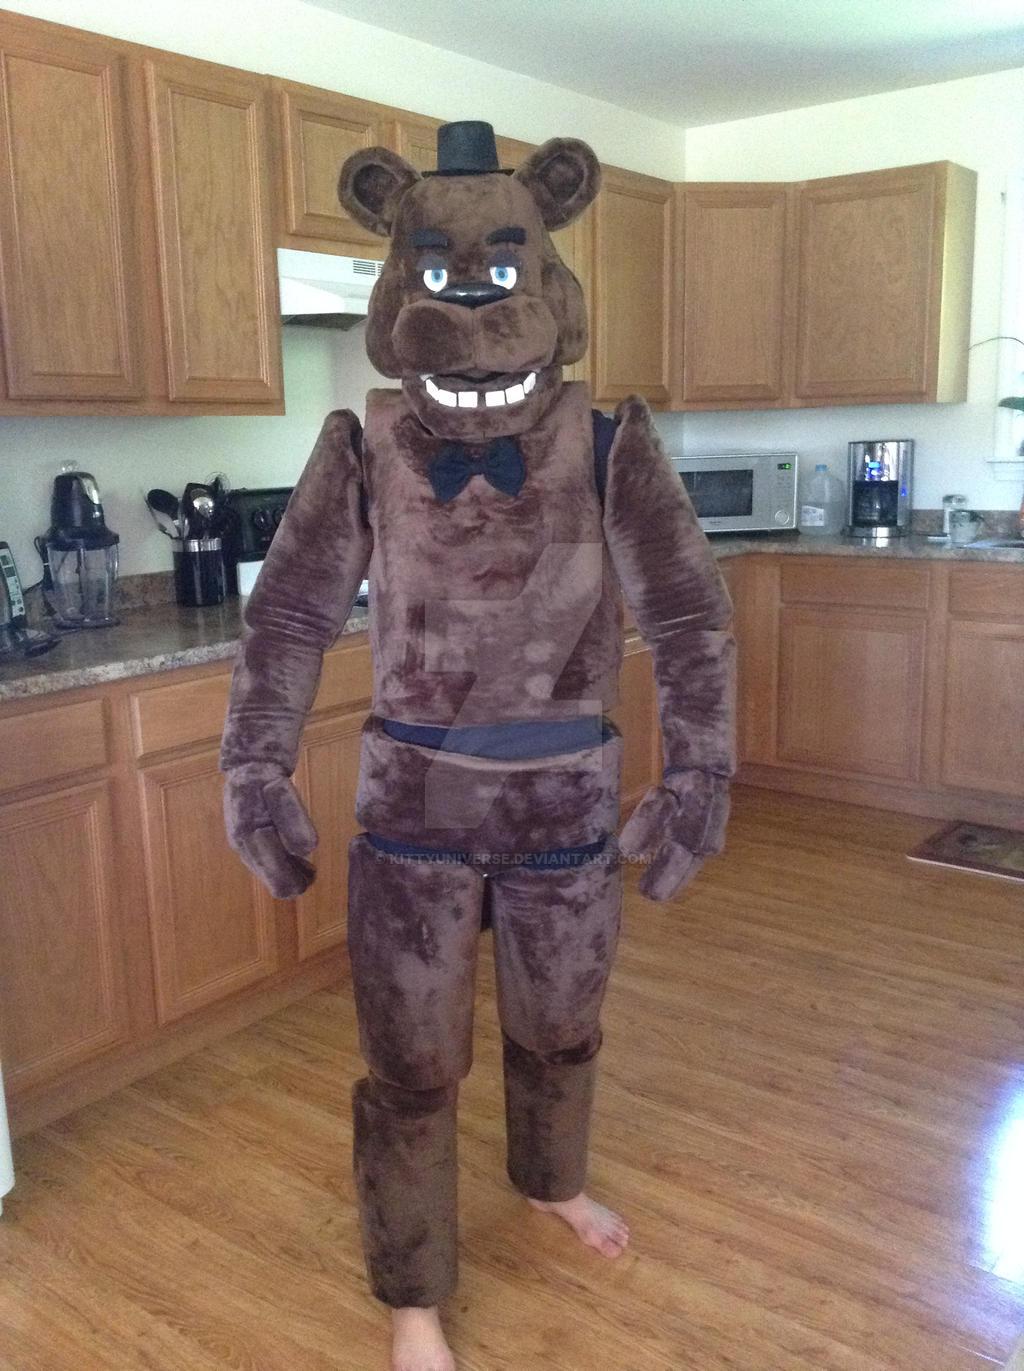 Freddy fazbear costume by kittyuniverse on deviantart